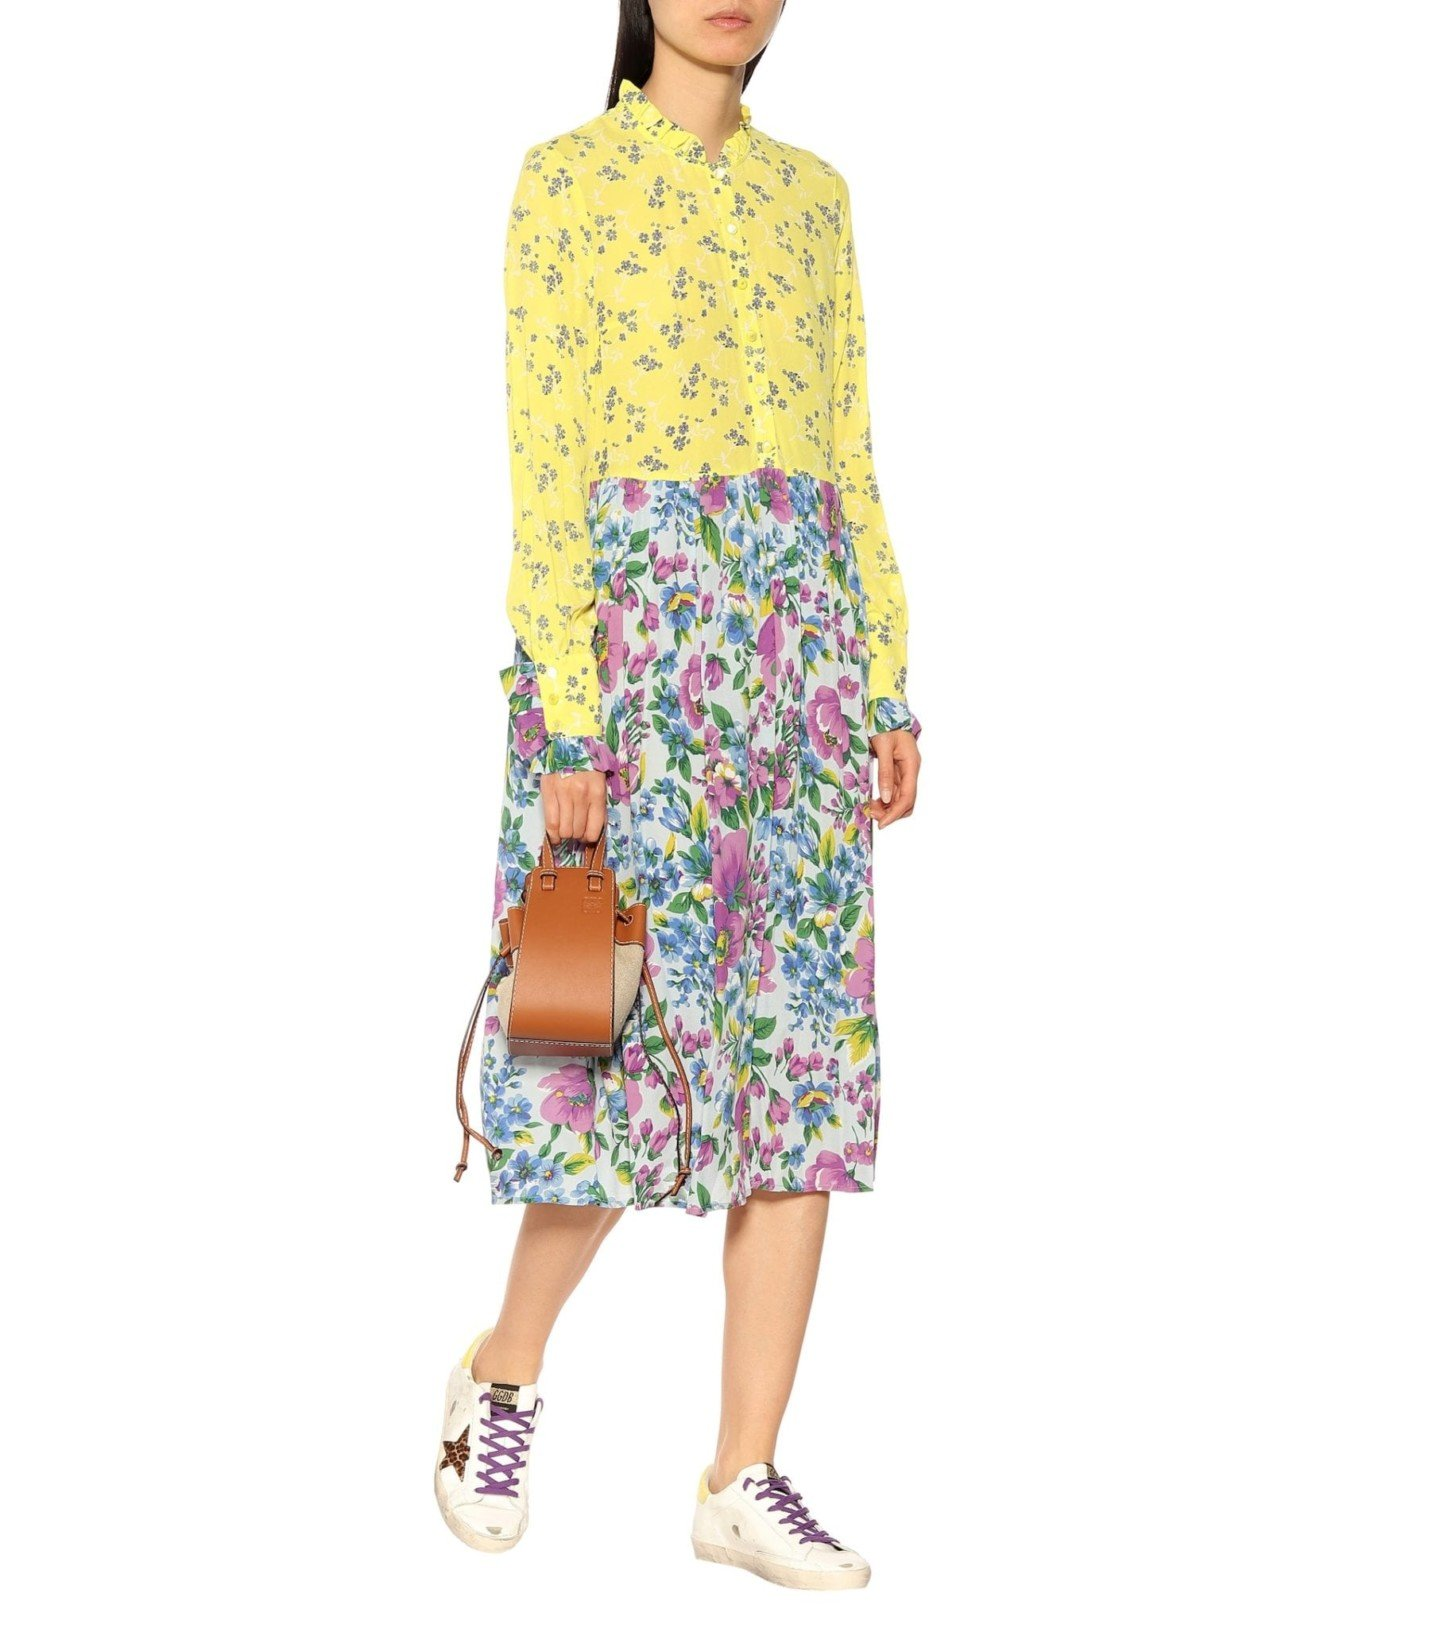 BAUM UND PFERDGARTEN Exclusive To Mytheresa – Acacia Silk-Blend Crêpe Yellow Dress